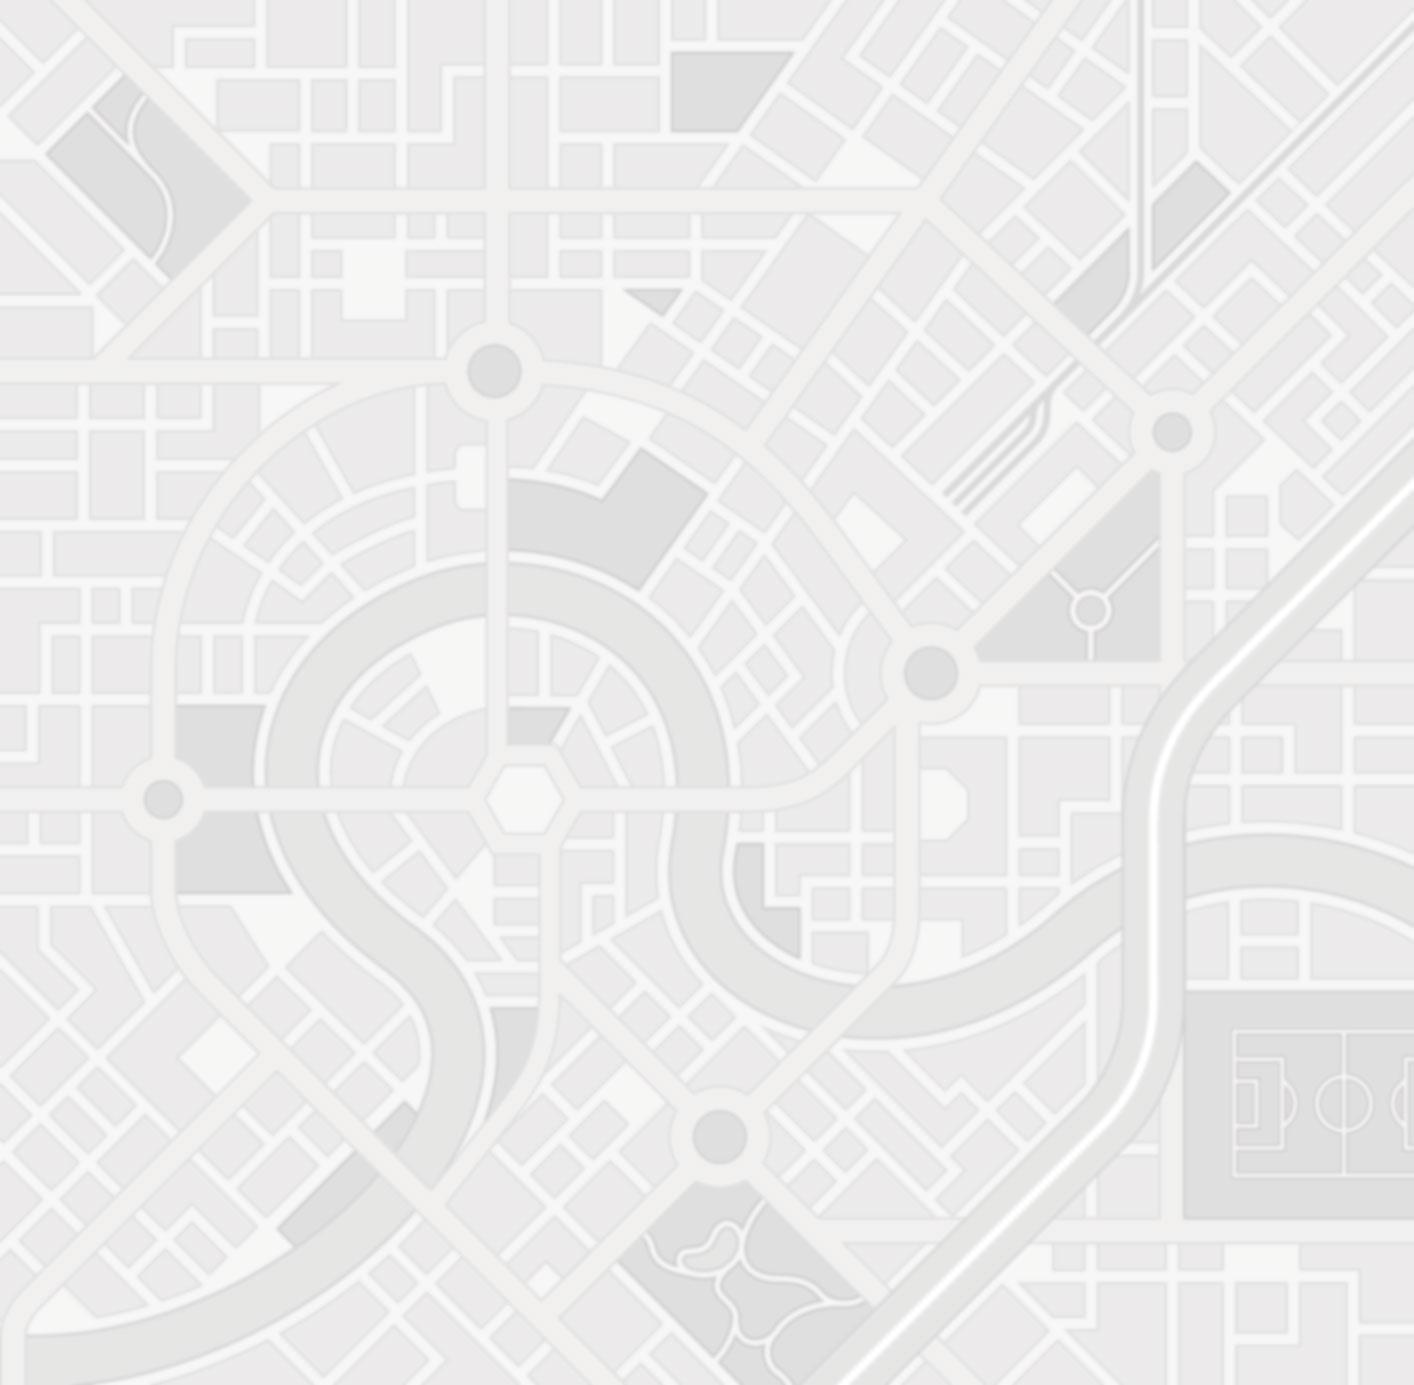 Map-Background-2.jpg